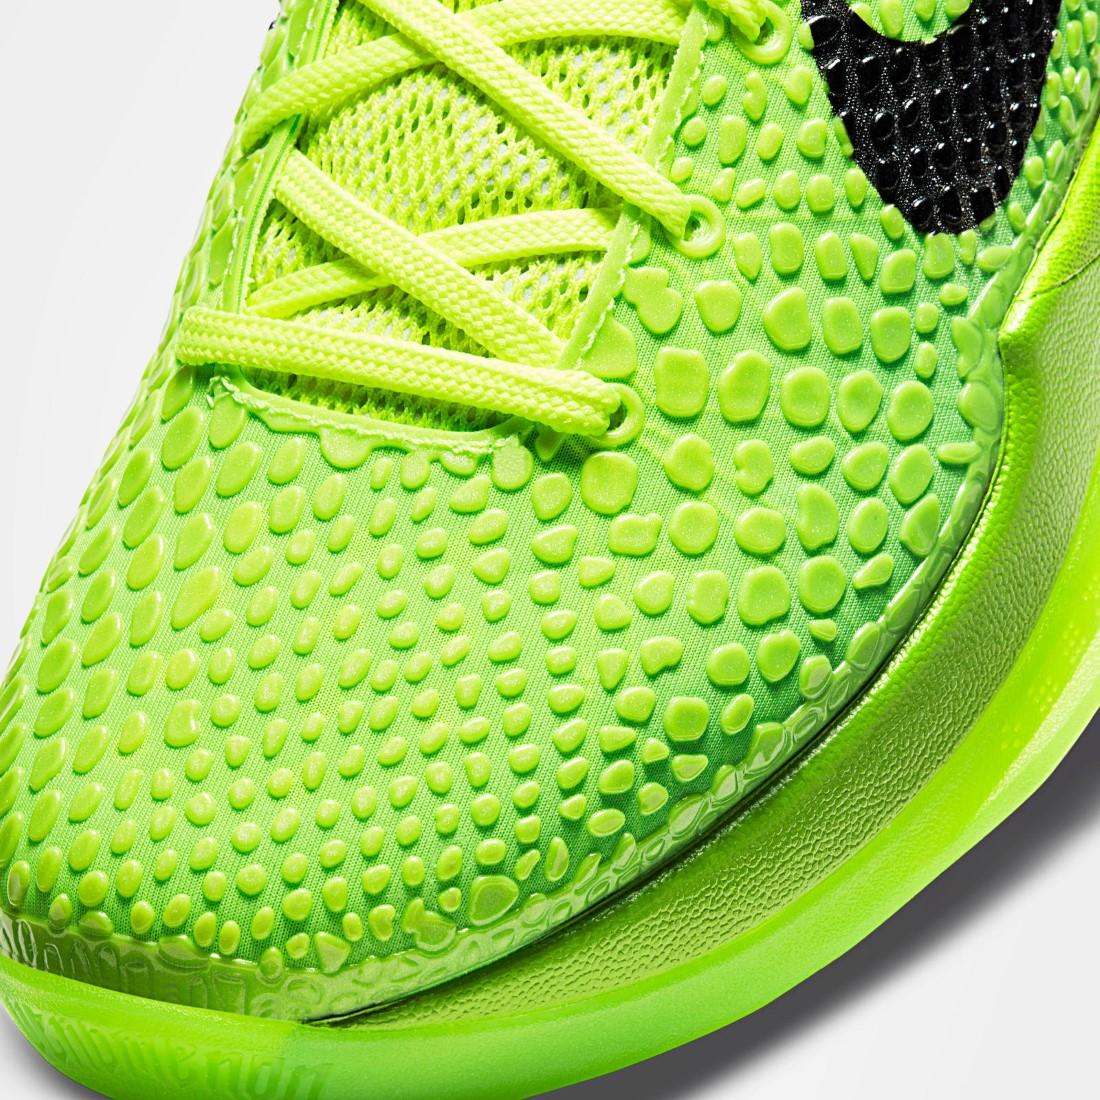 Nike Kobe 6 Protro Grinch